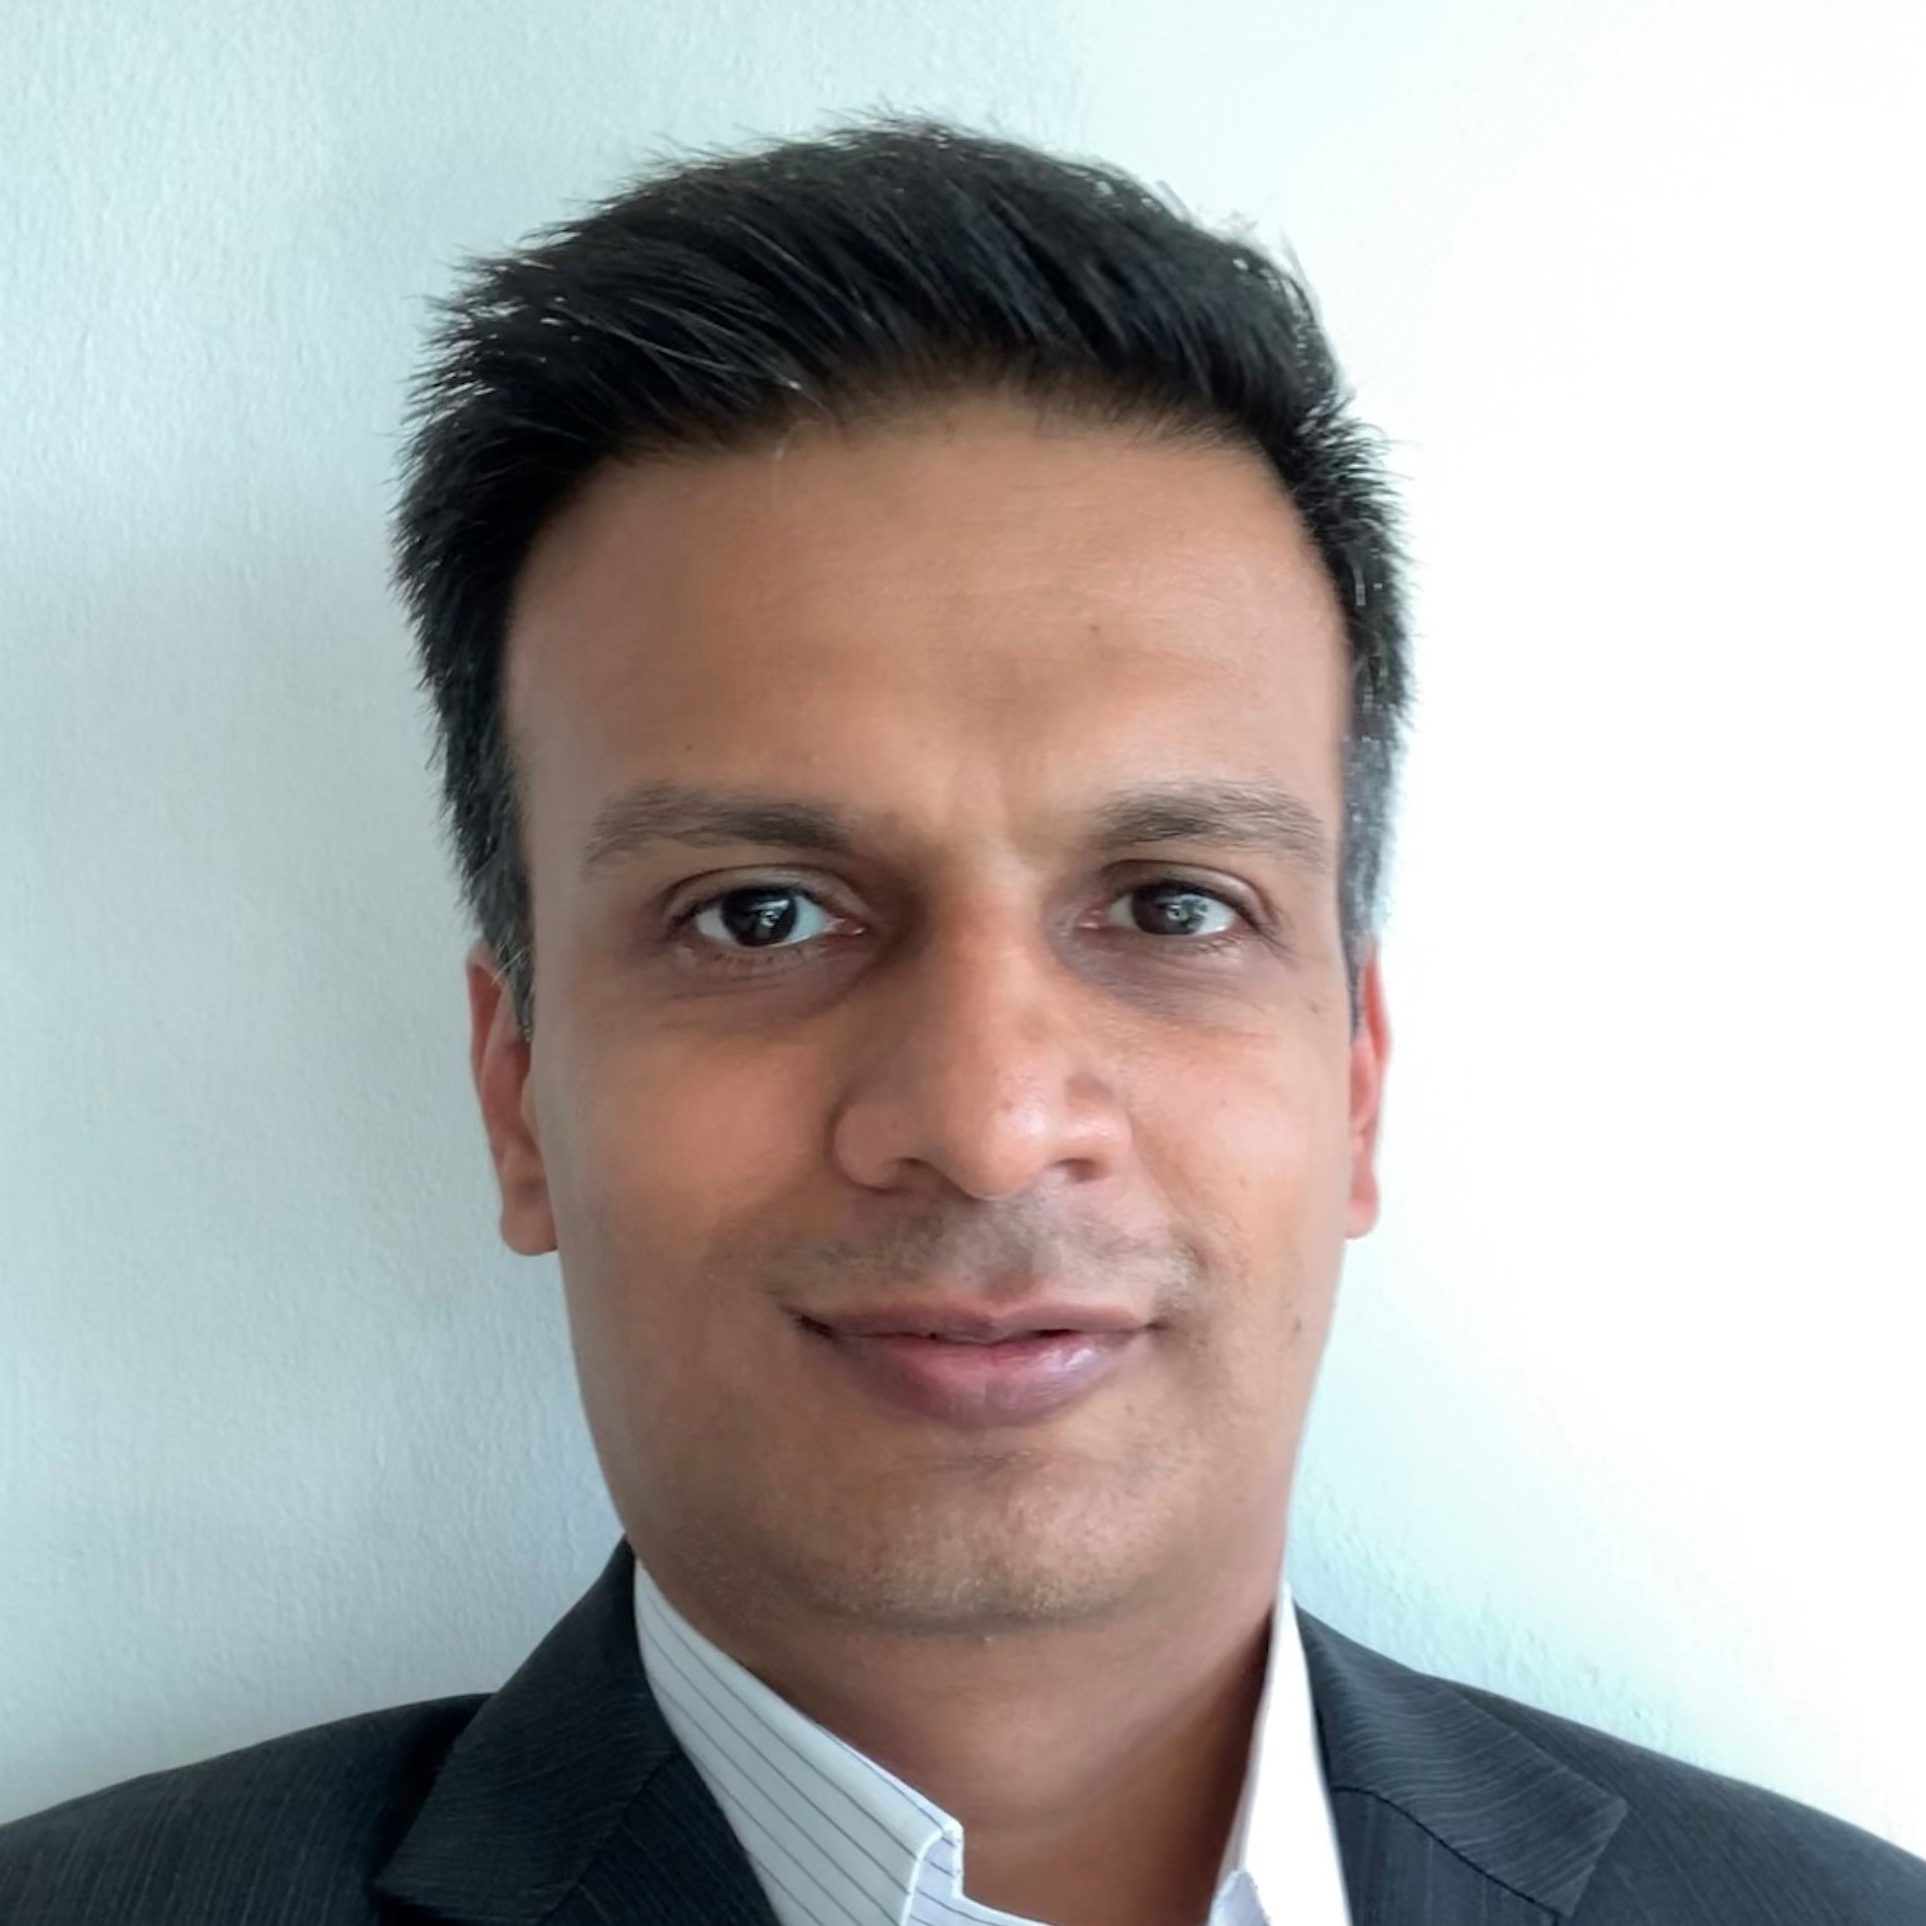 Manish Gurbuxani (CEO Office)